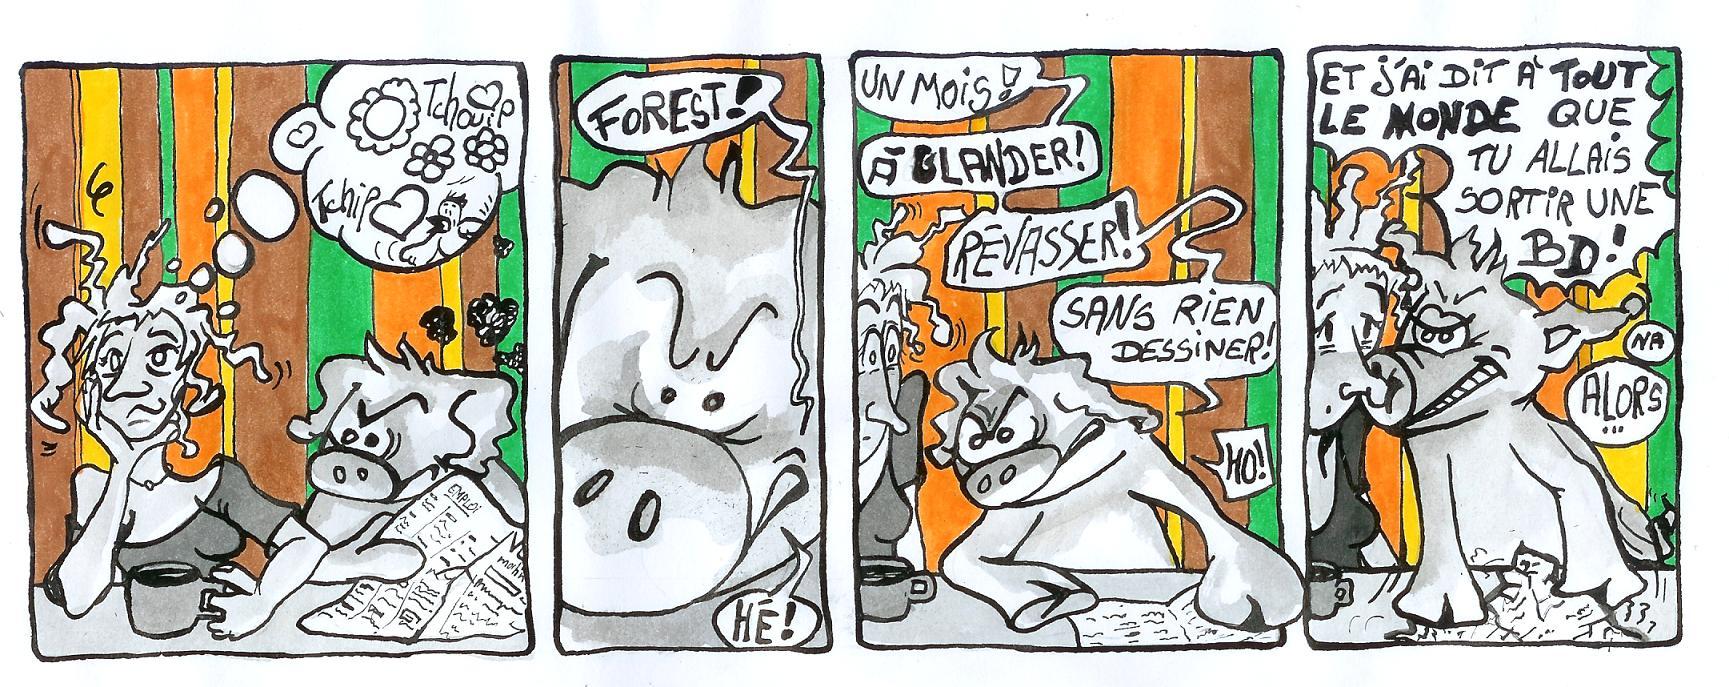 Groink et Forest glandouillent